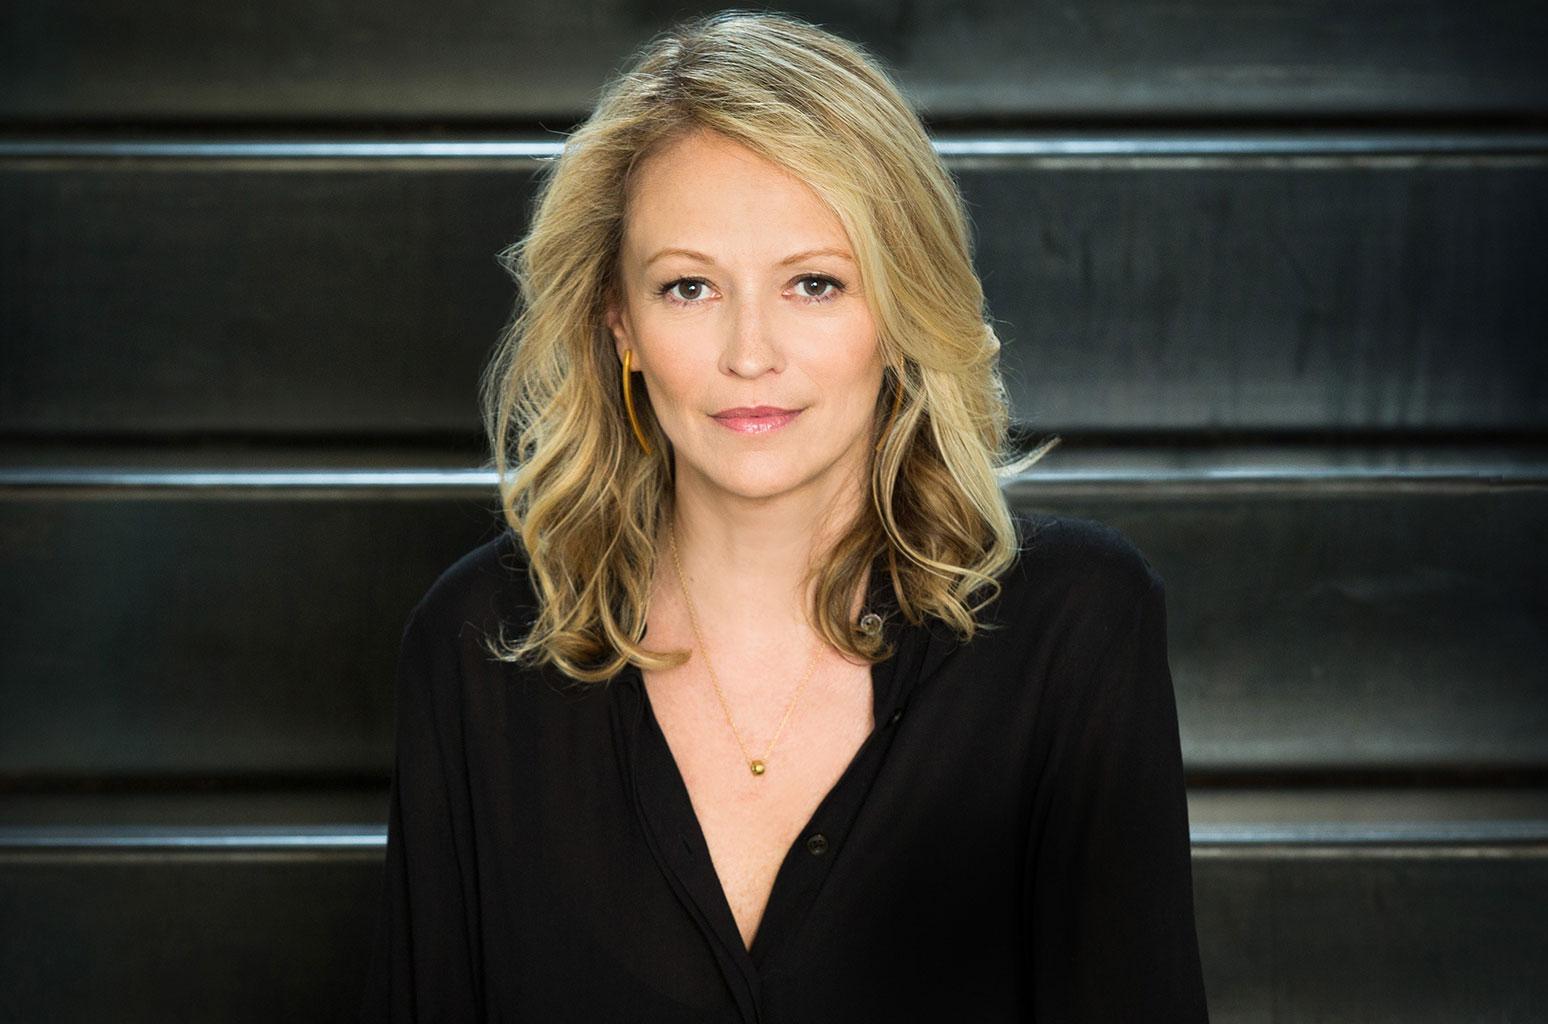 Jennifer-Justice-press-by-Lisa-Houlgrave-2019-billboard-1548.jpg